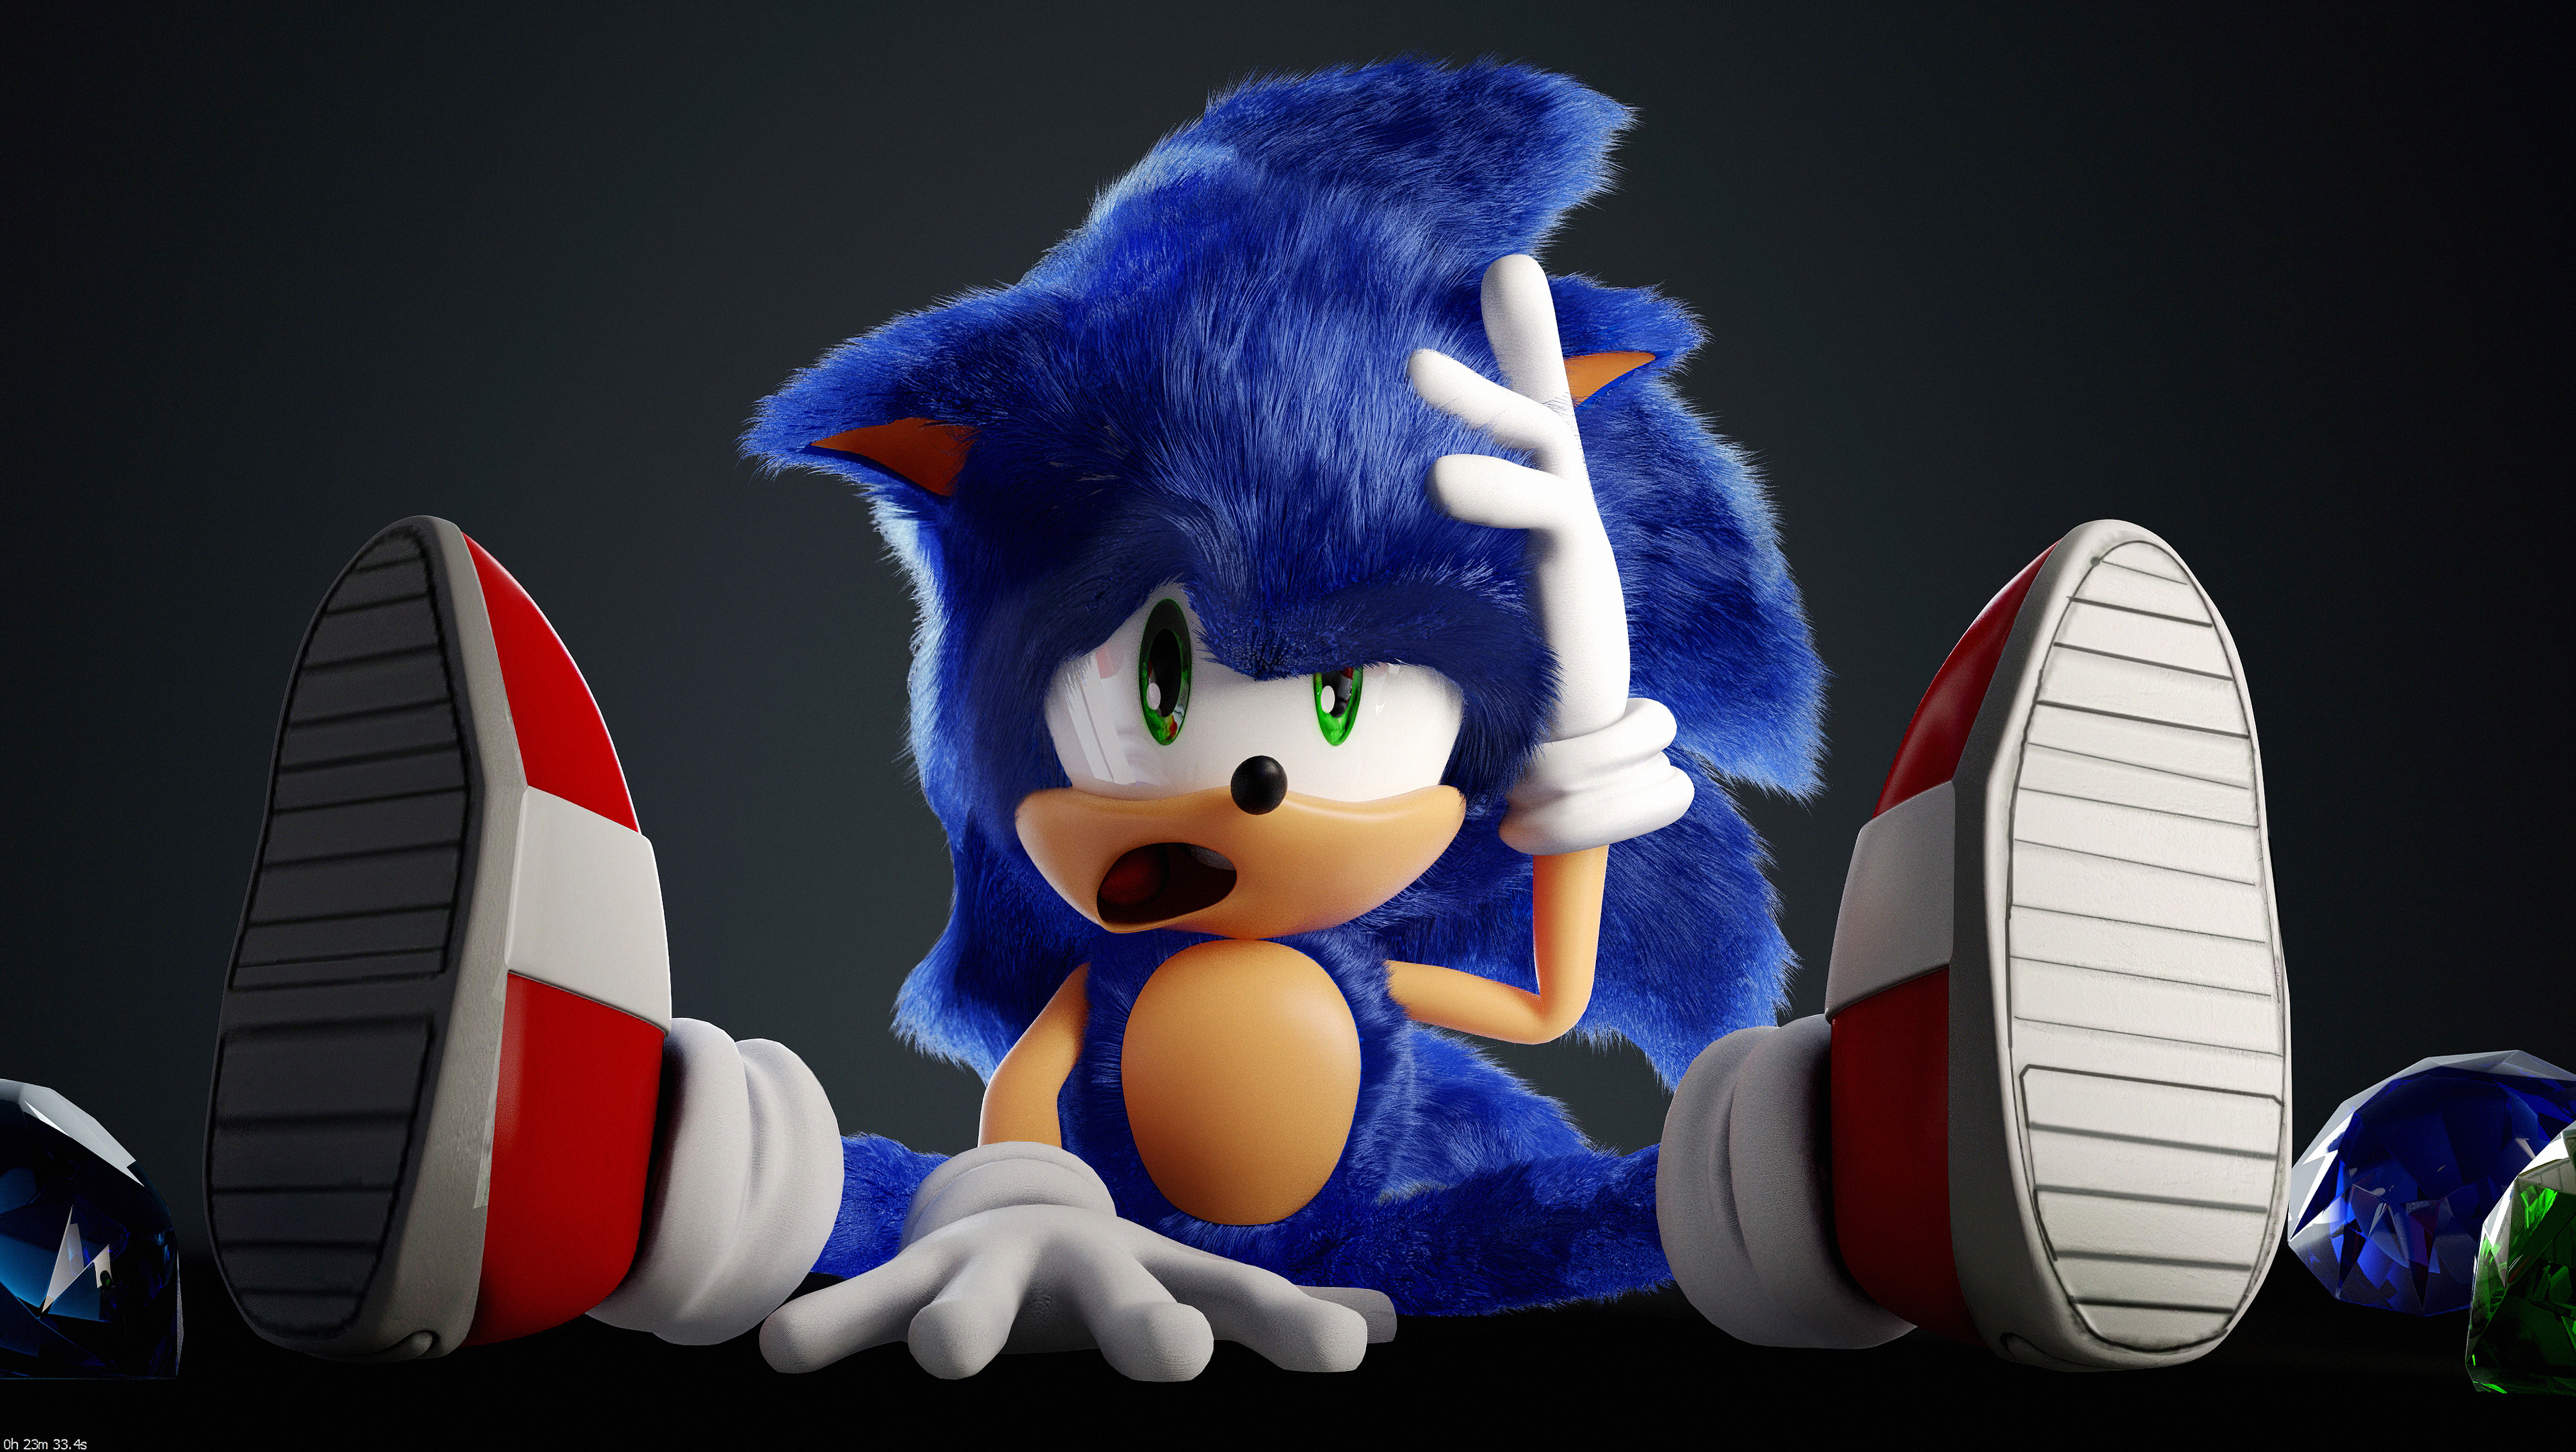 sonic the hedgehog 1575659852 - Sonic The Hedgehog -